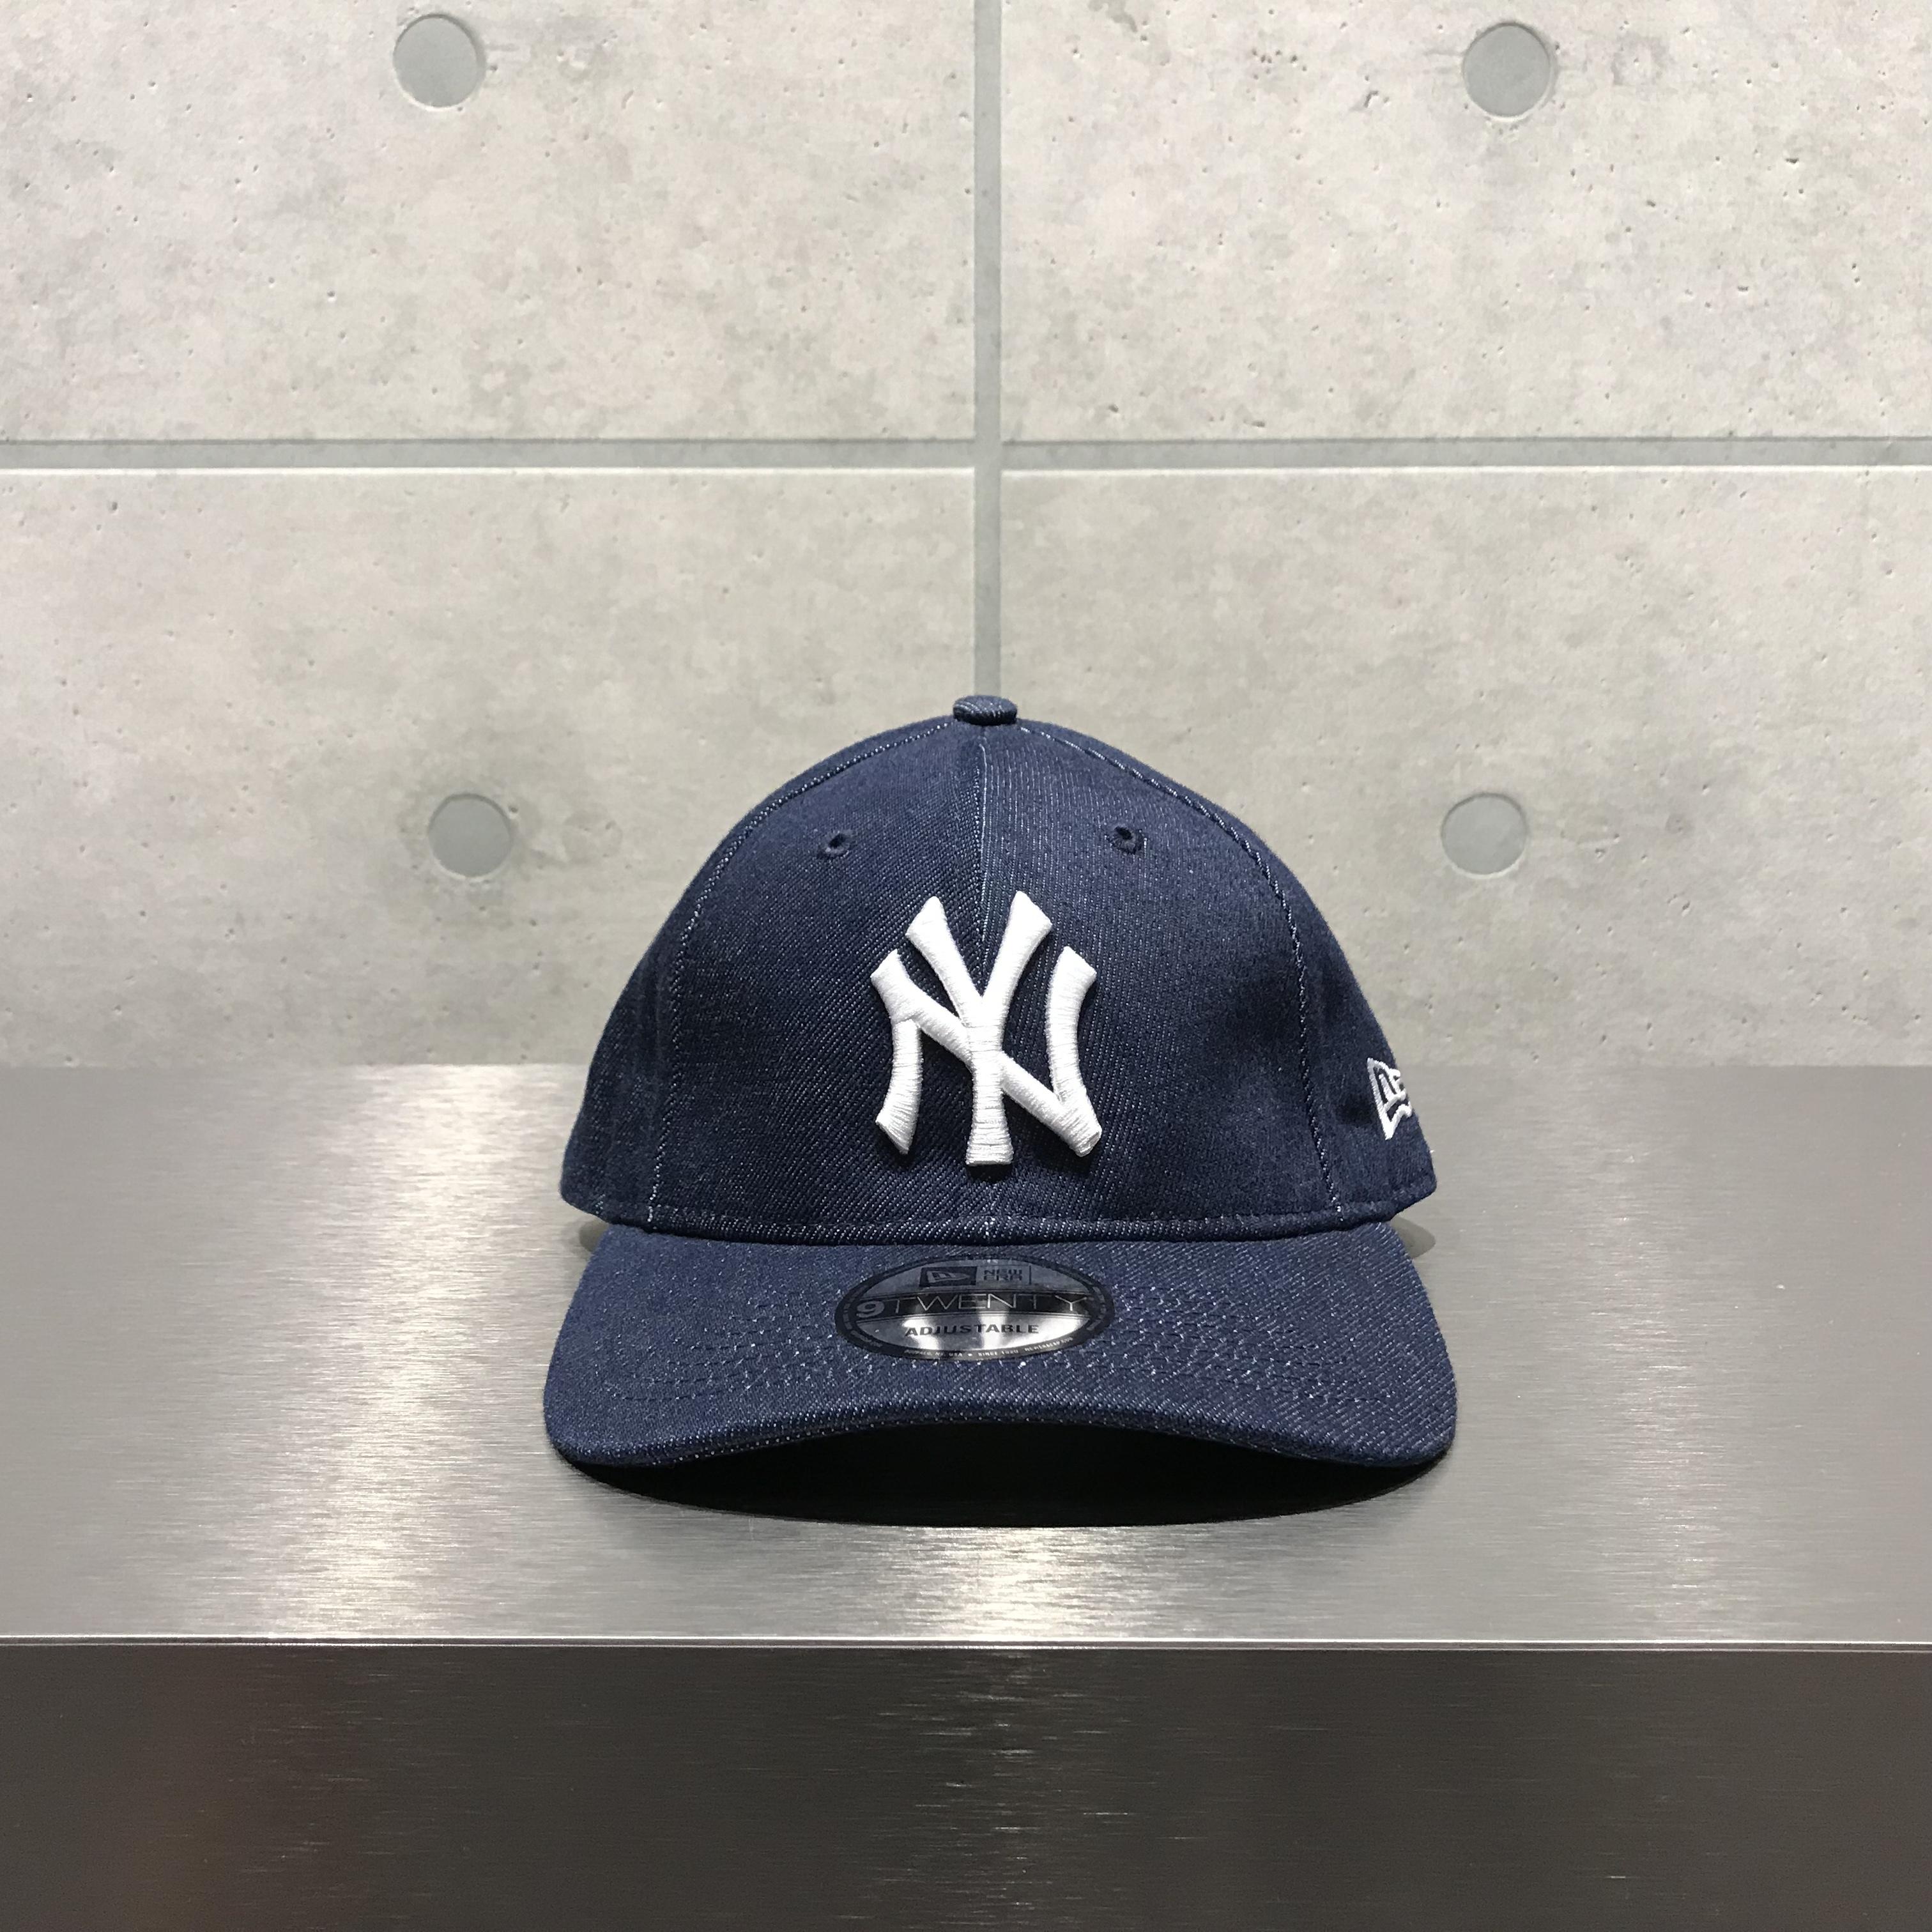 NEW ERA x Levi's x NEW YORK YANKEES 9TWENTY Snapback Cap